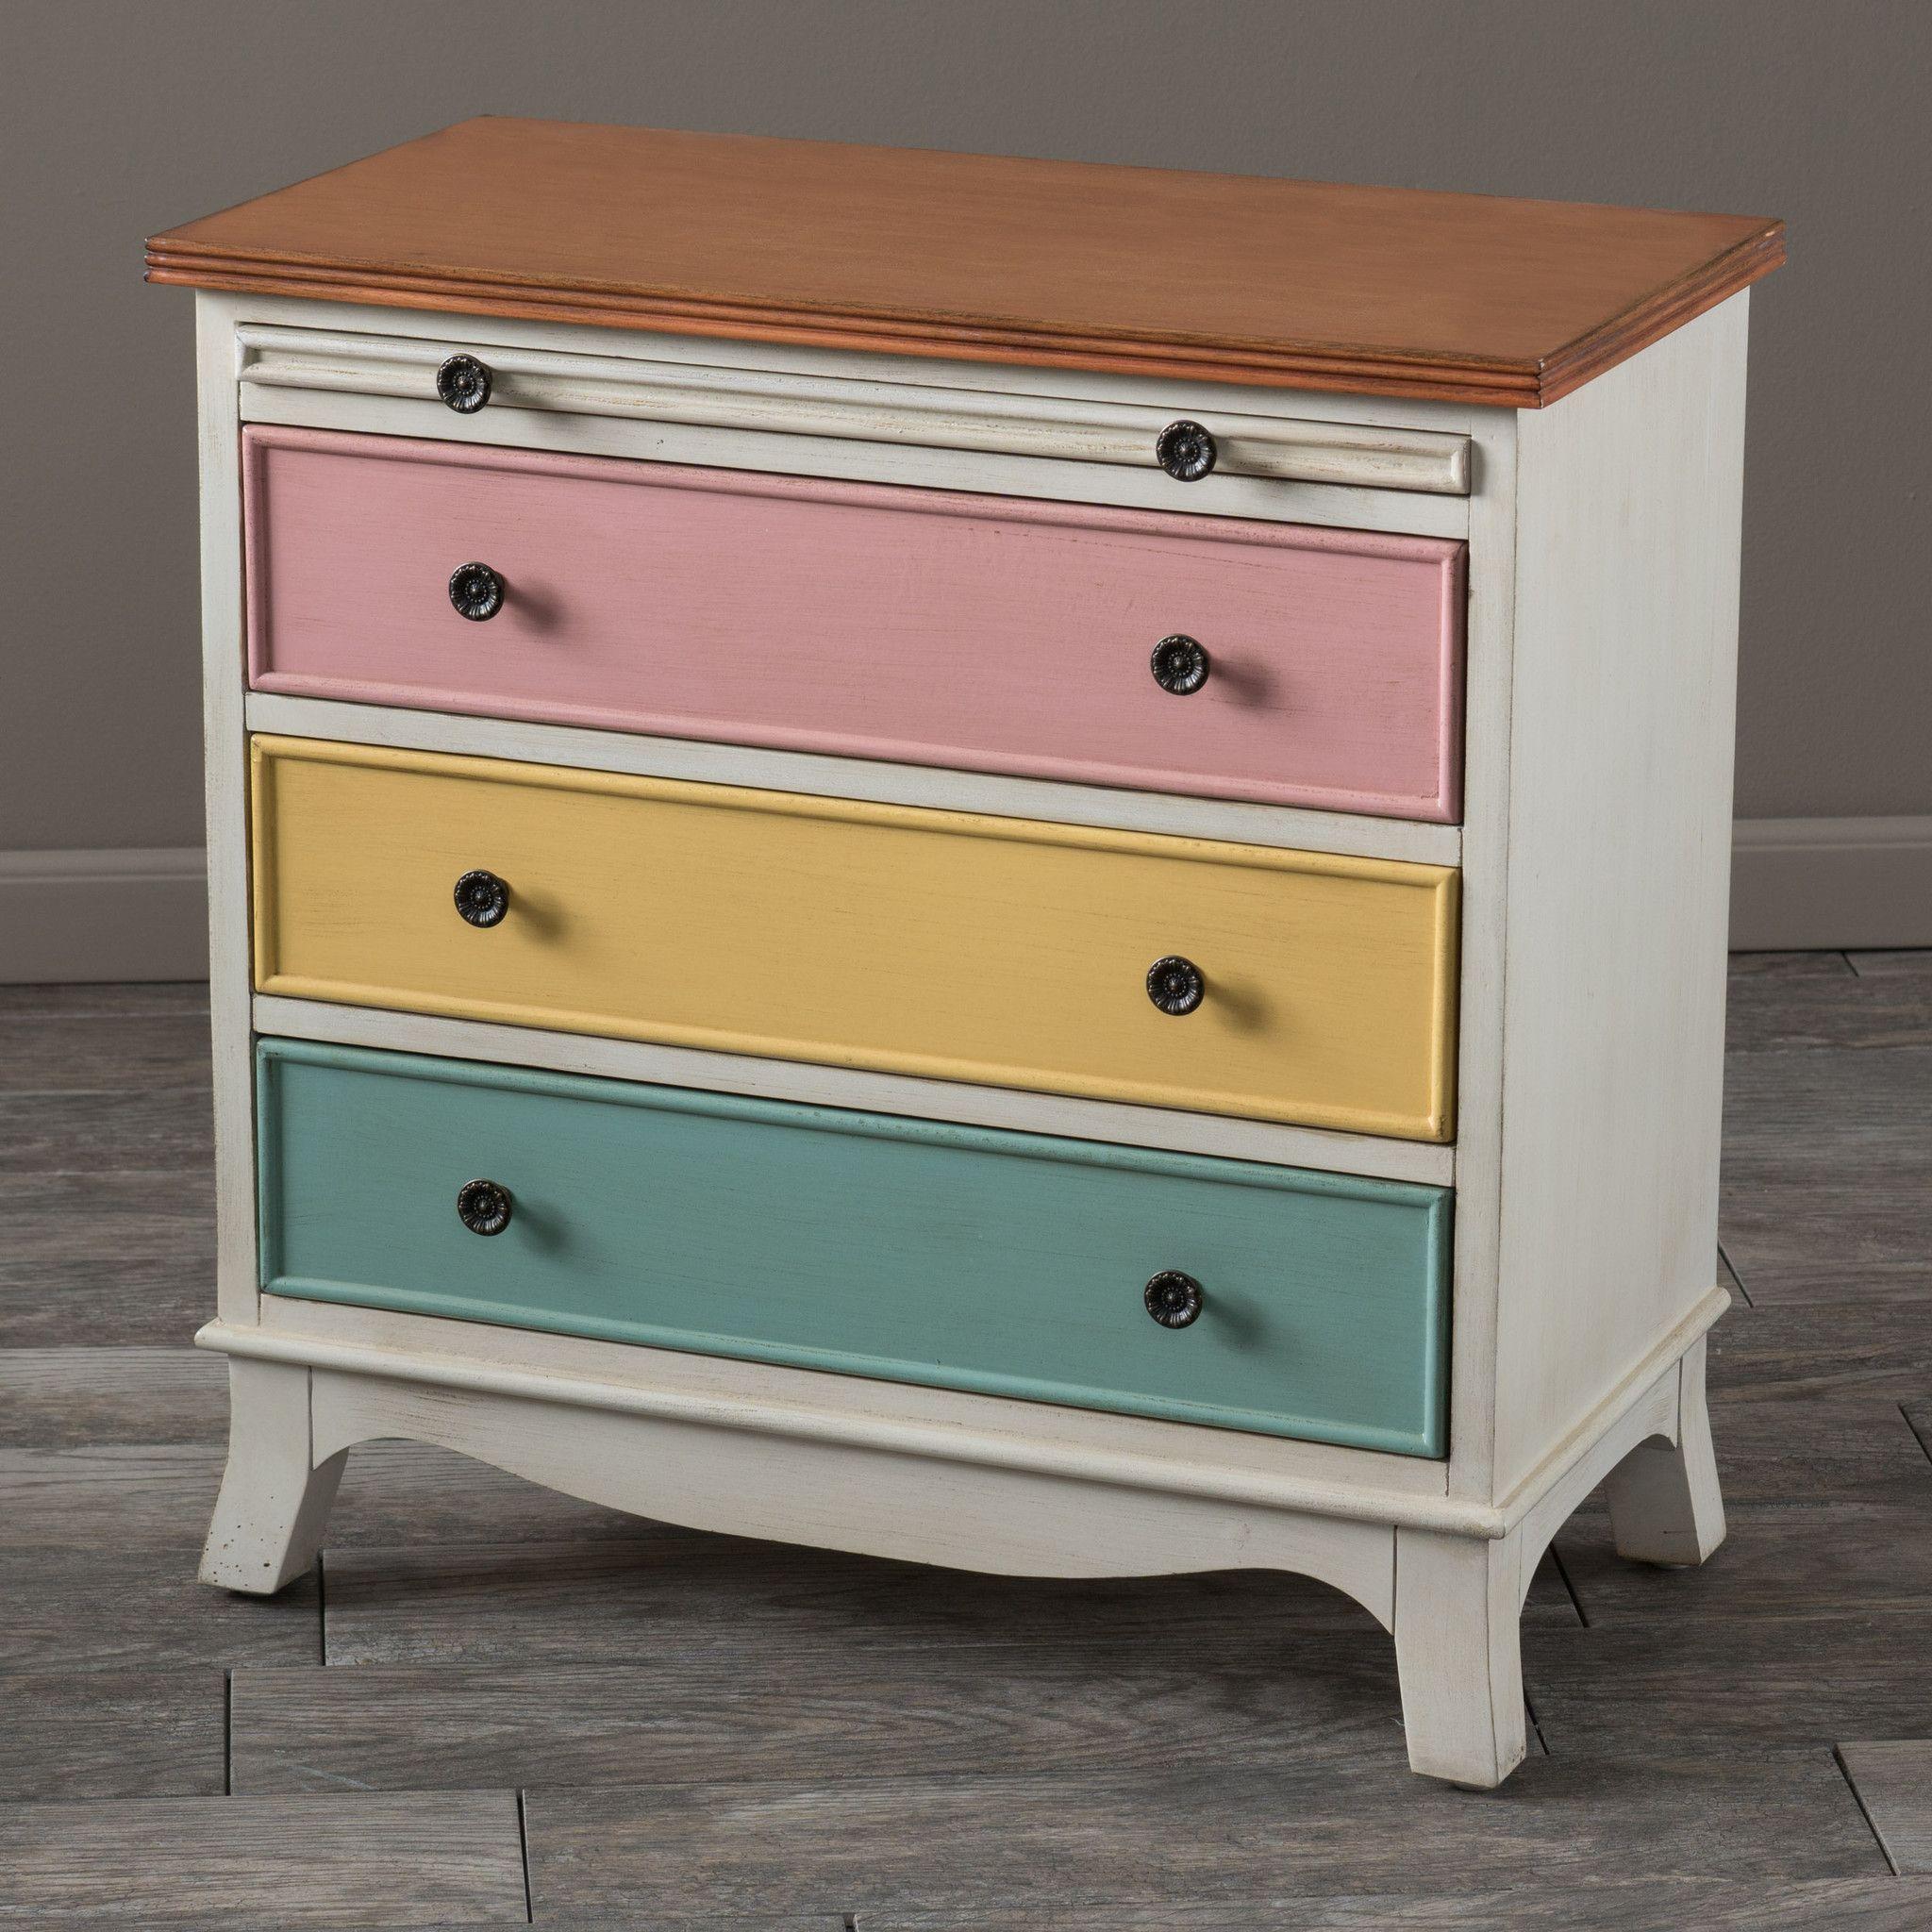 drawer pulls for furniture. Artour Multicolor 3-Drawer Pull-out Shelf Wood Cabinet Dresser Drawer Pulls For Furniture S